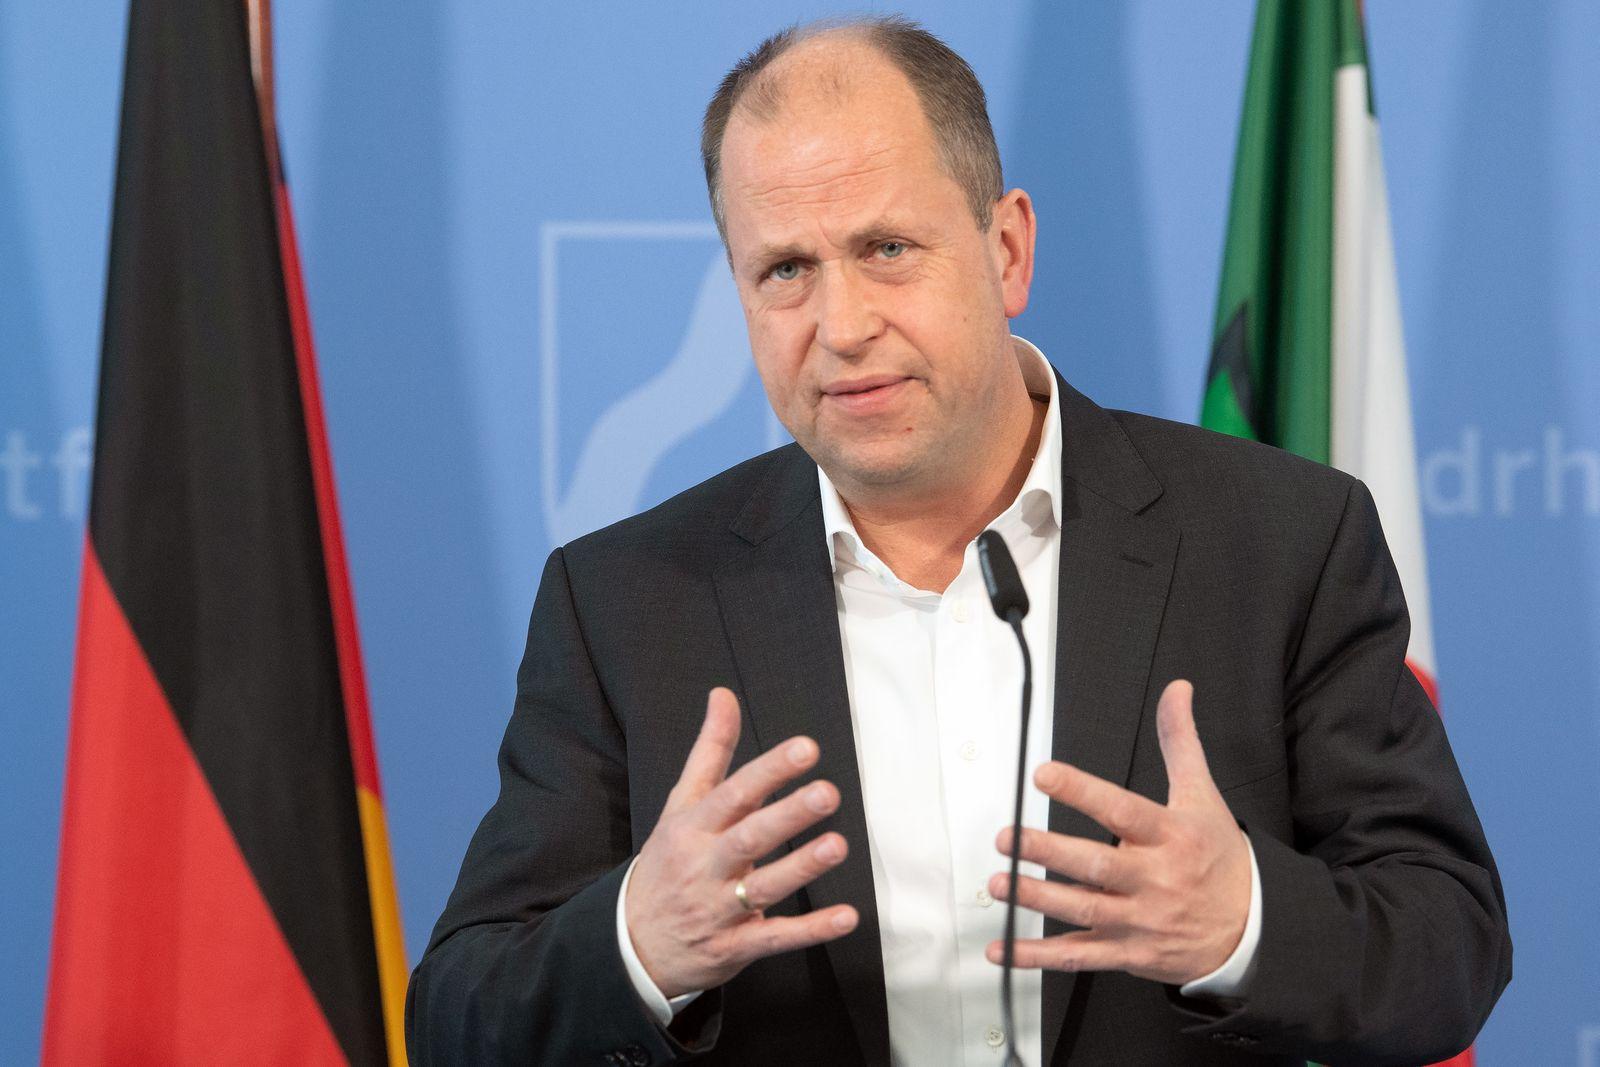 Coronavirus - Landesregierung NRW